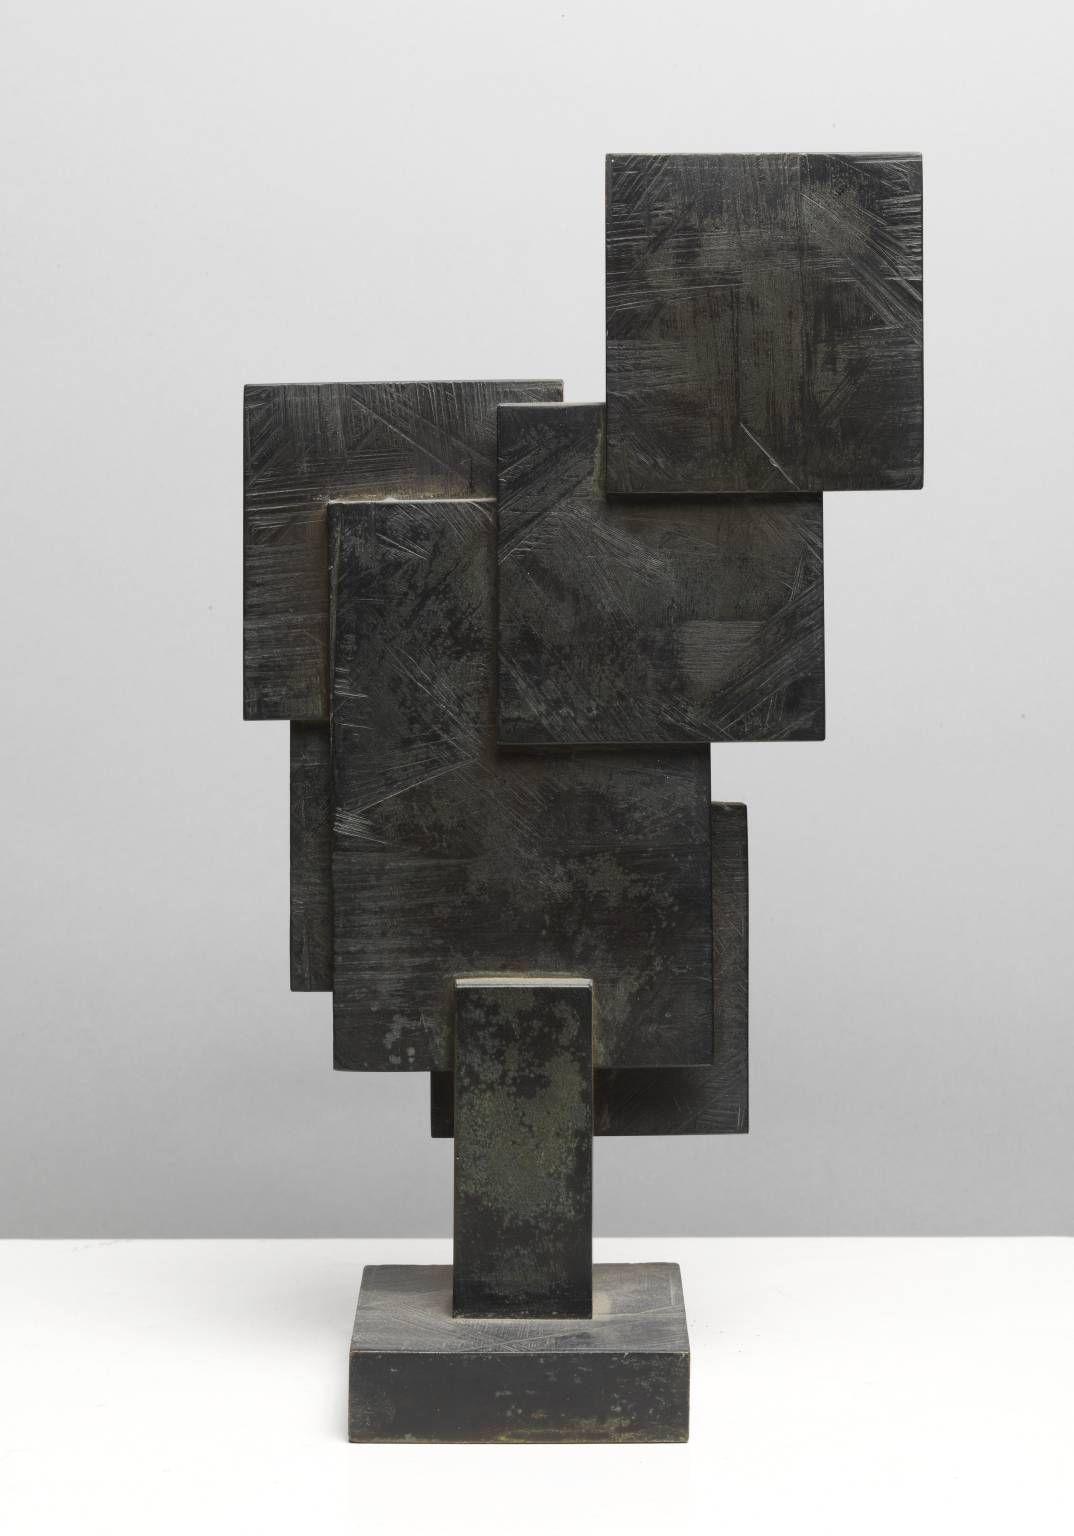 barbara hepworth, square forms, 1962 … | sculpture in 2018…